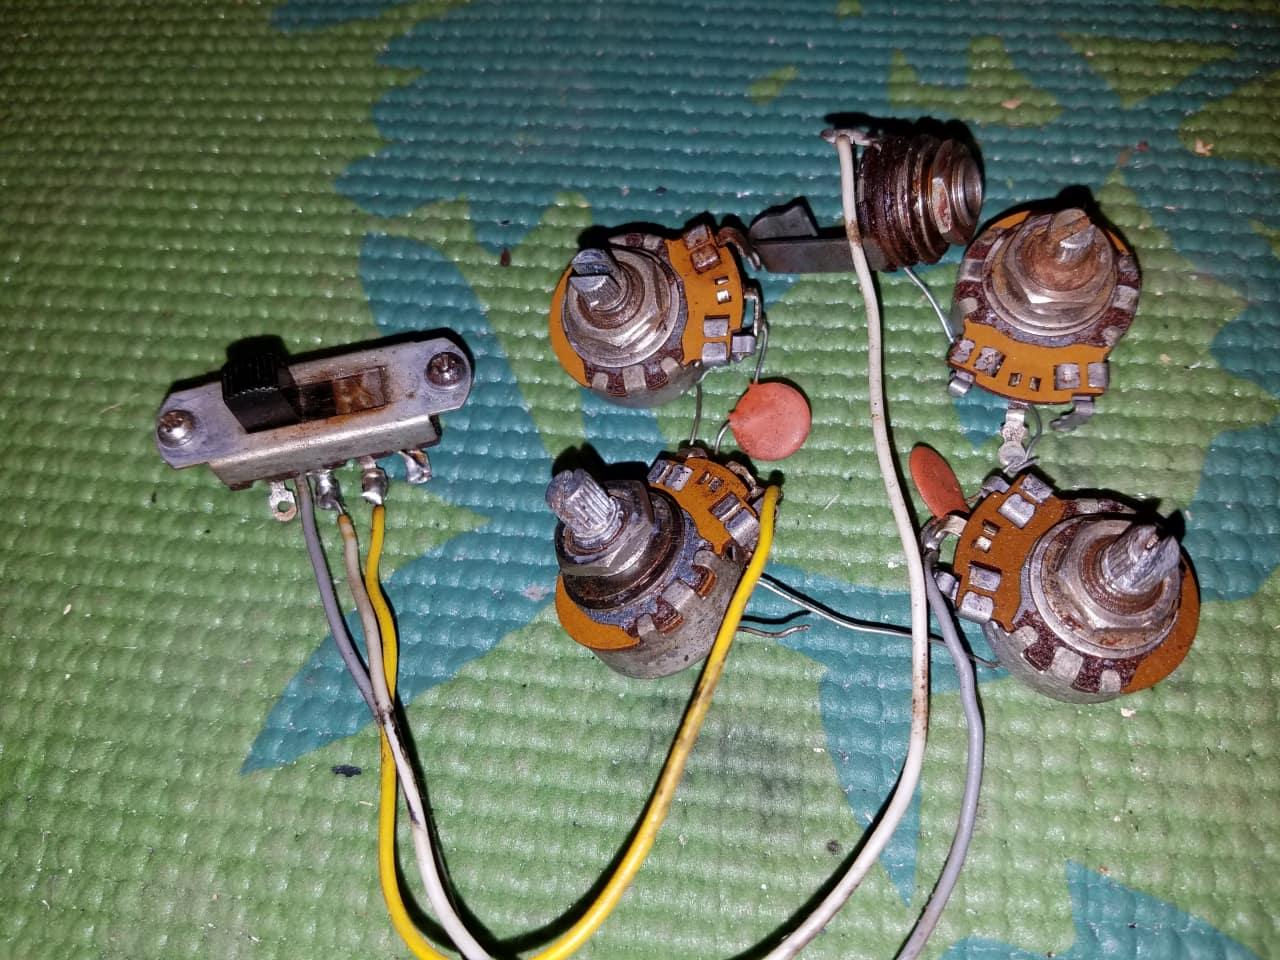 gibson melody maker wiring diagram vintage gibson melody maker or firebird non reverse wiring ... kitchenaid coffee maker wiring diagram